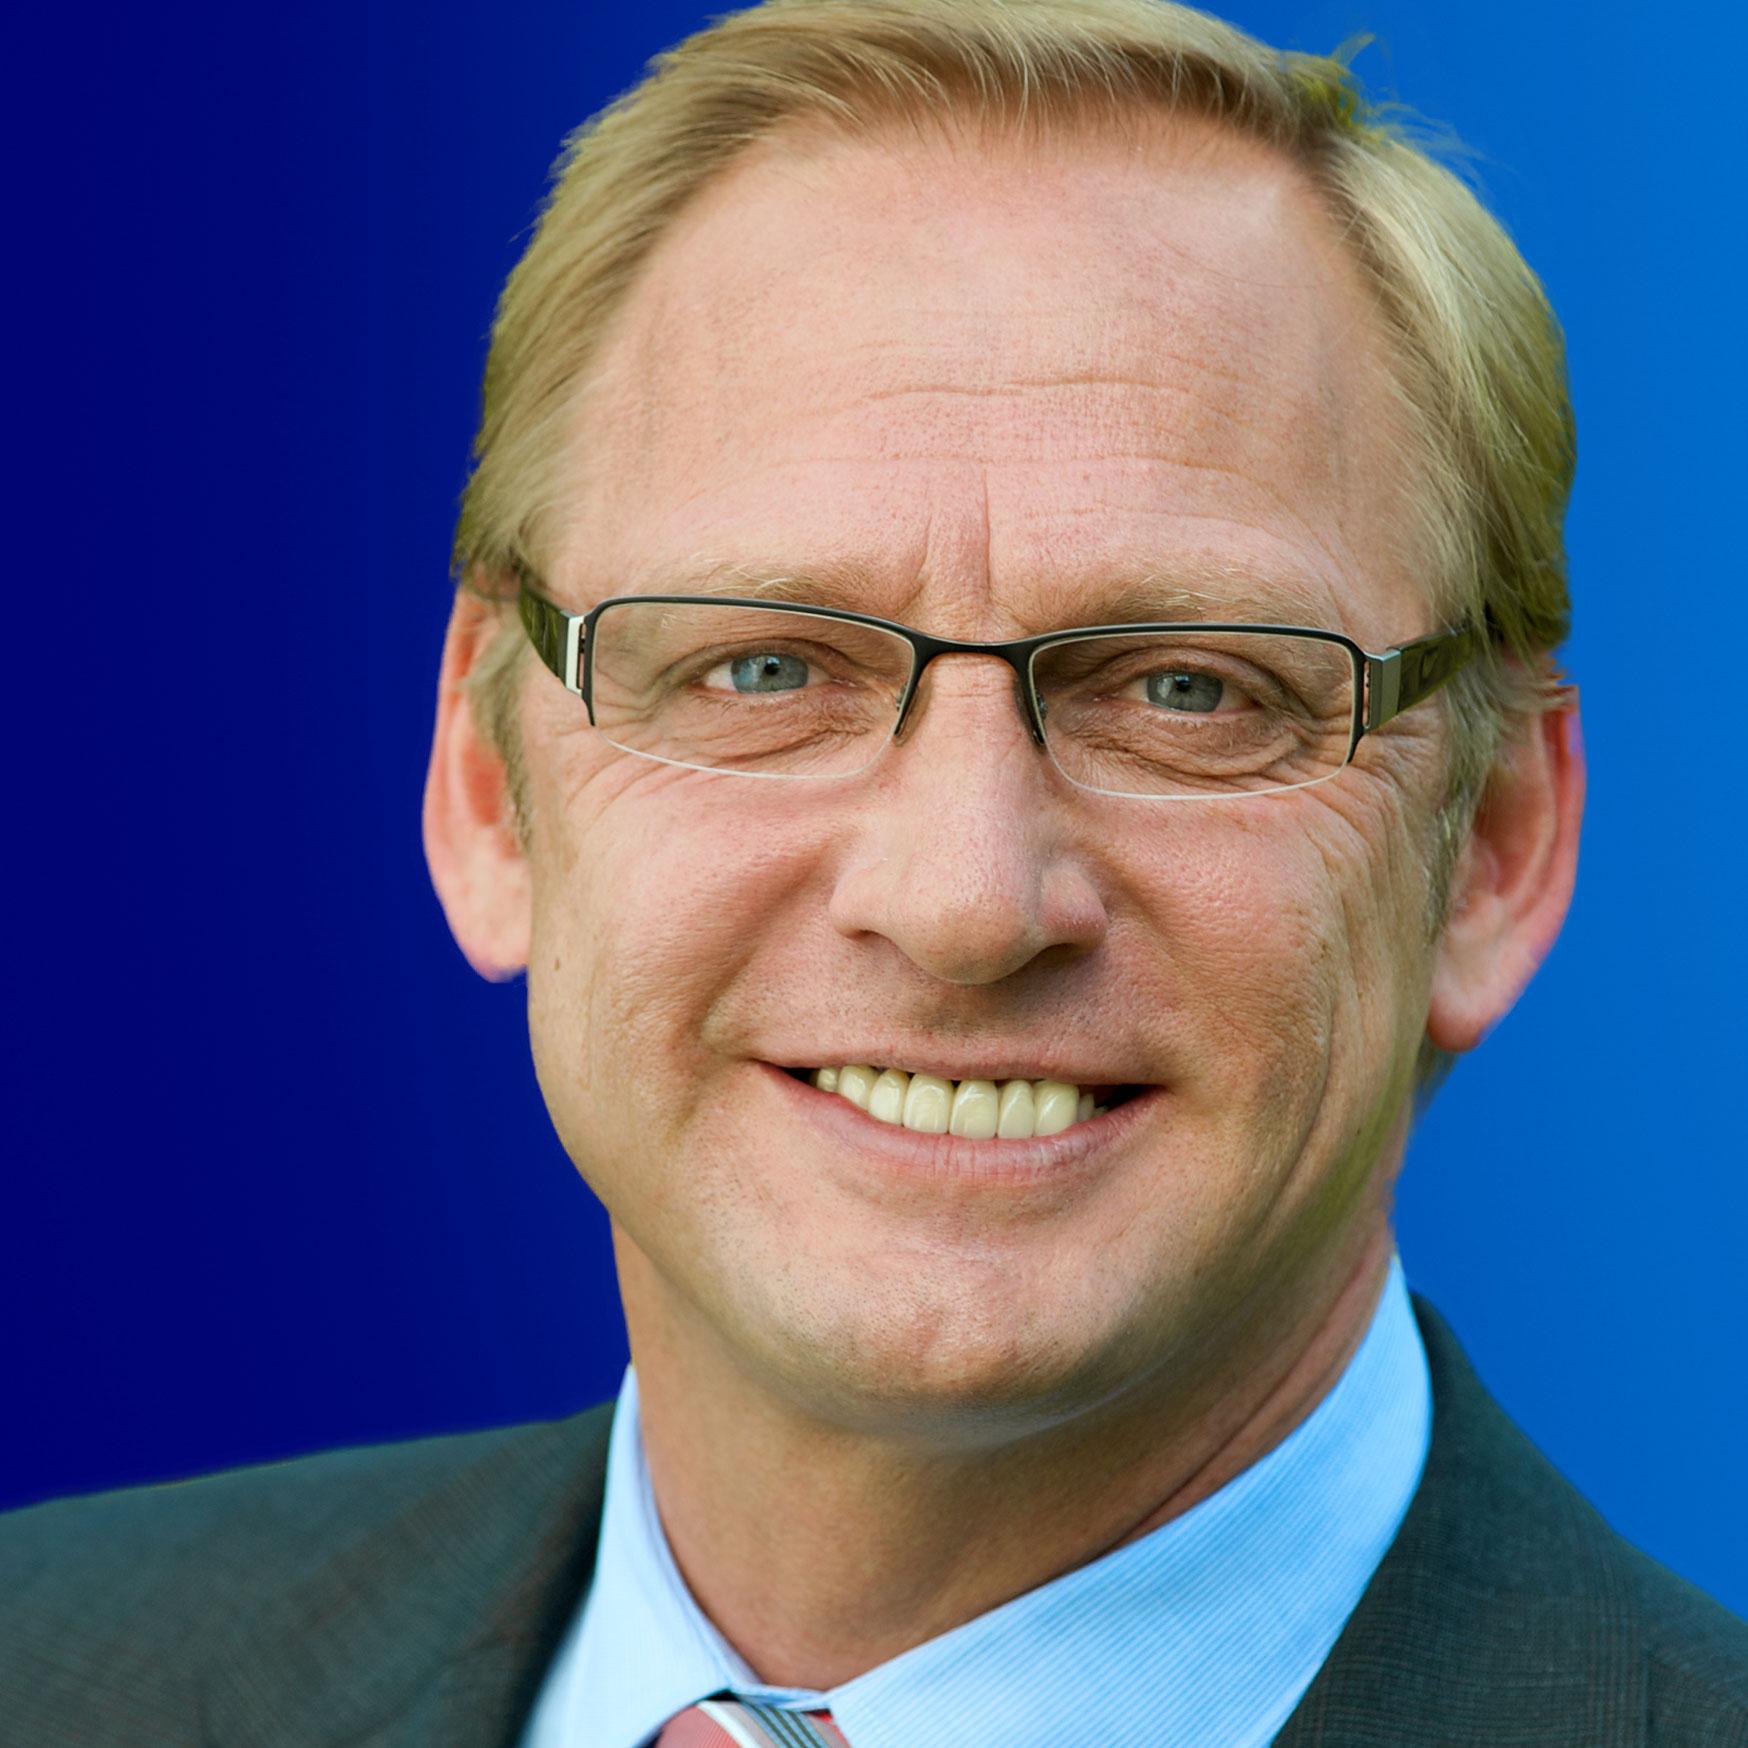 Landesvorsitzender Franz-Josef Holzenkamp MdB